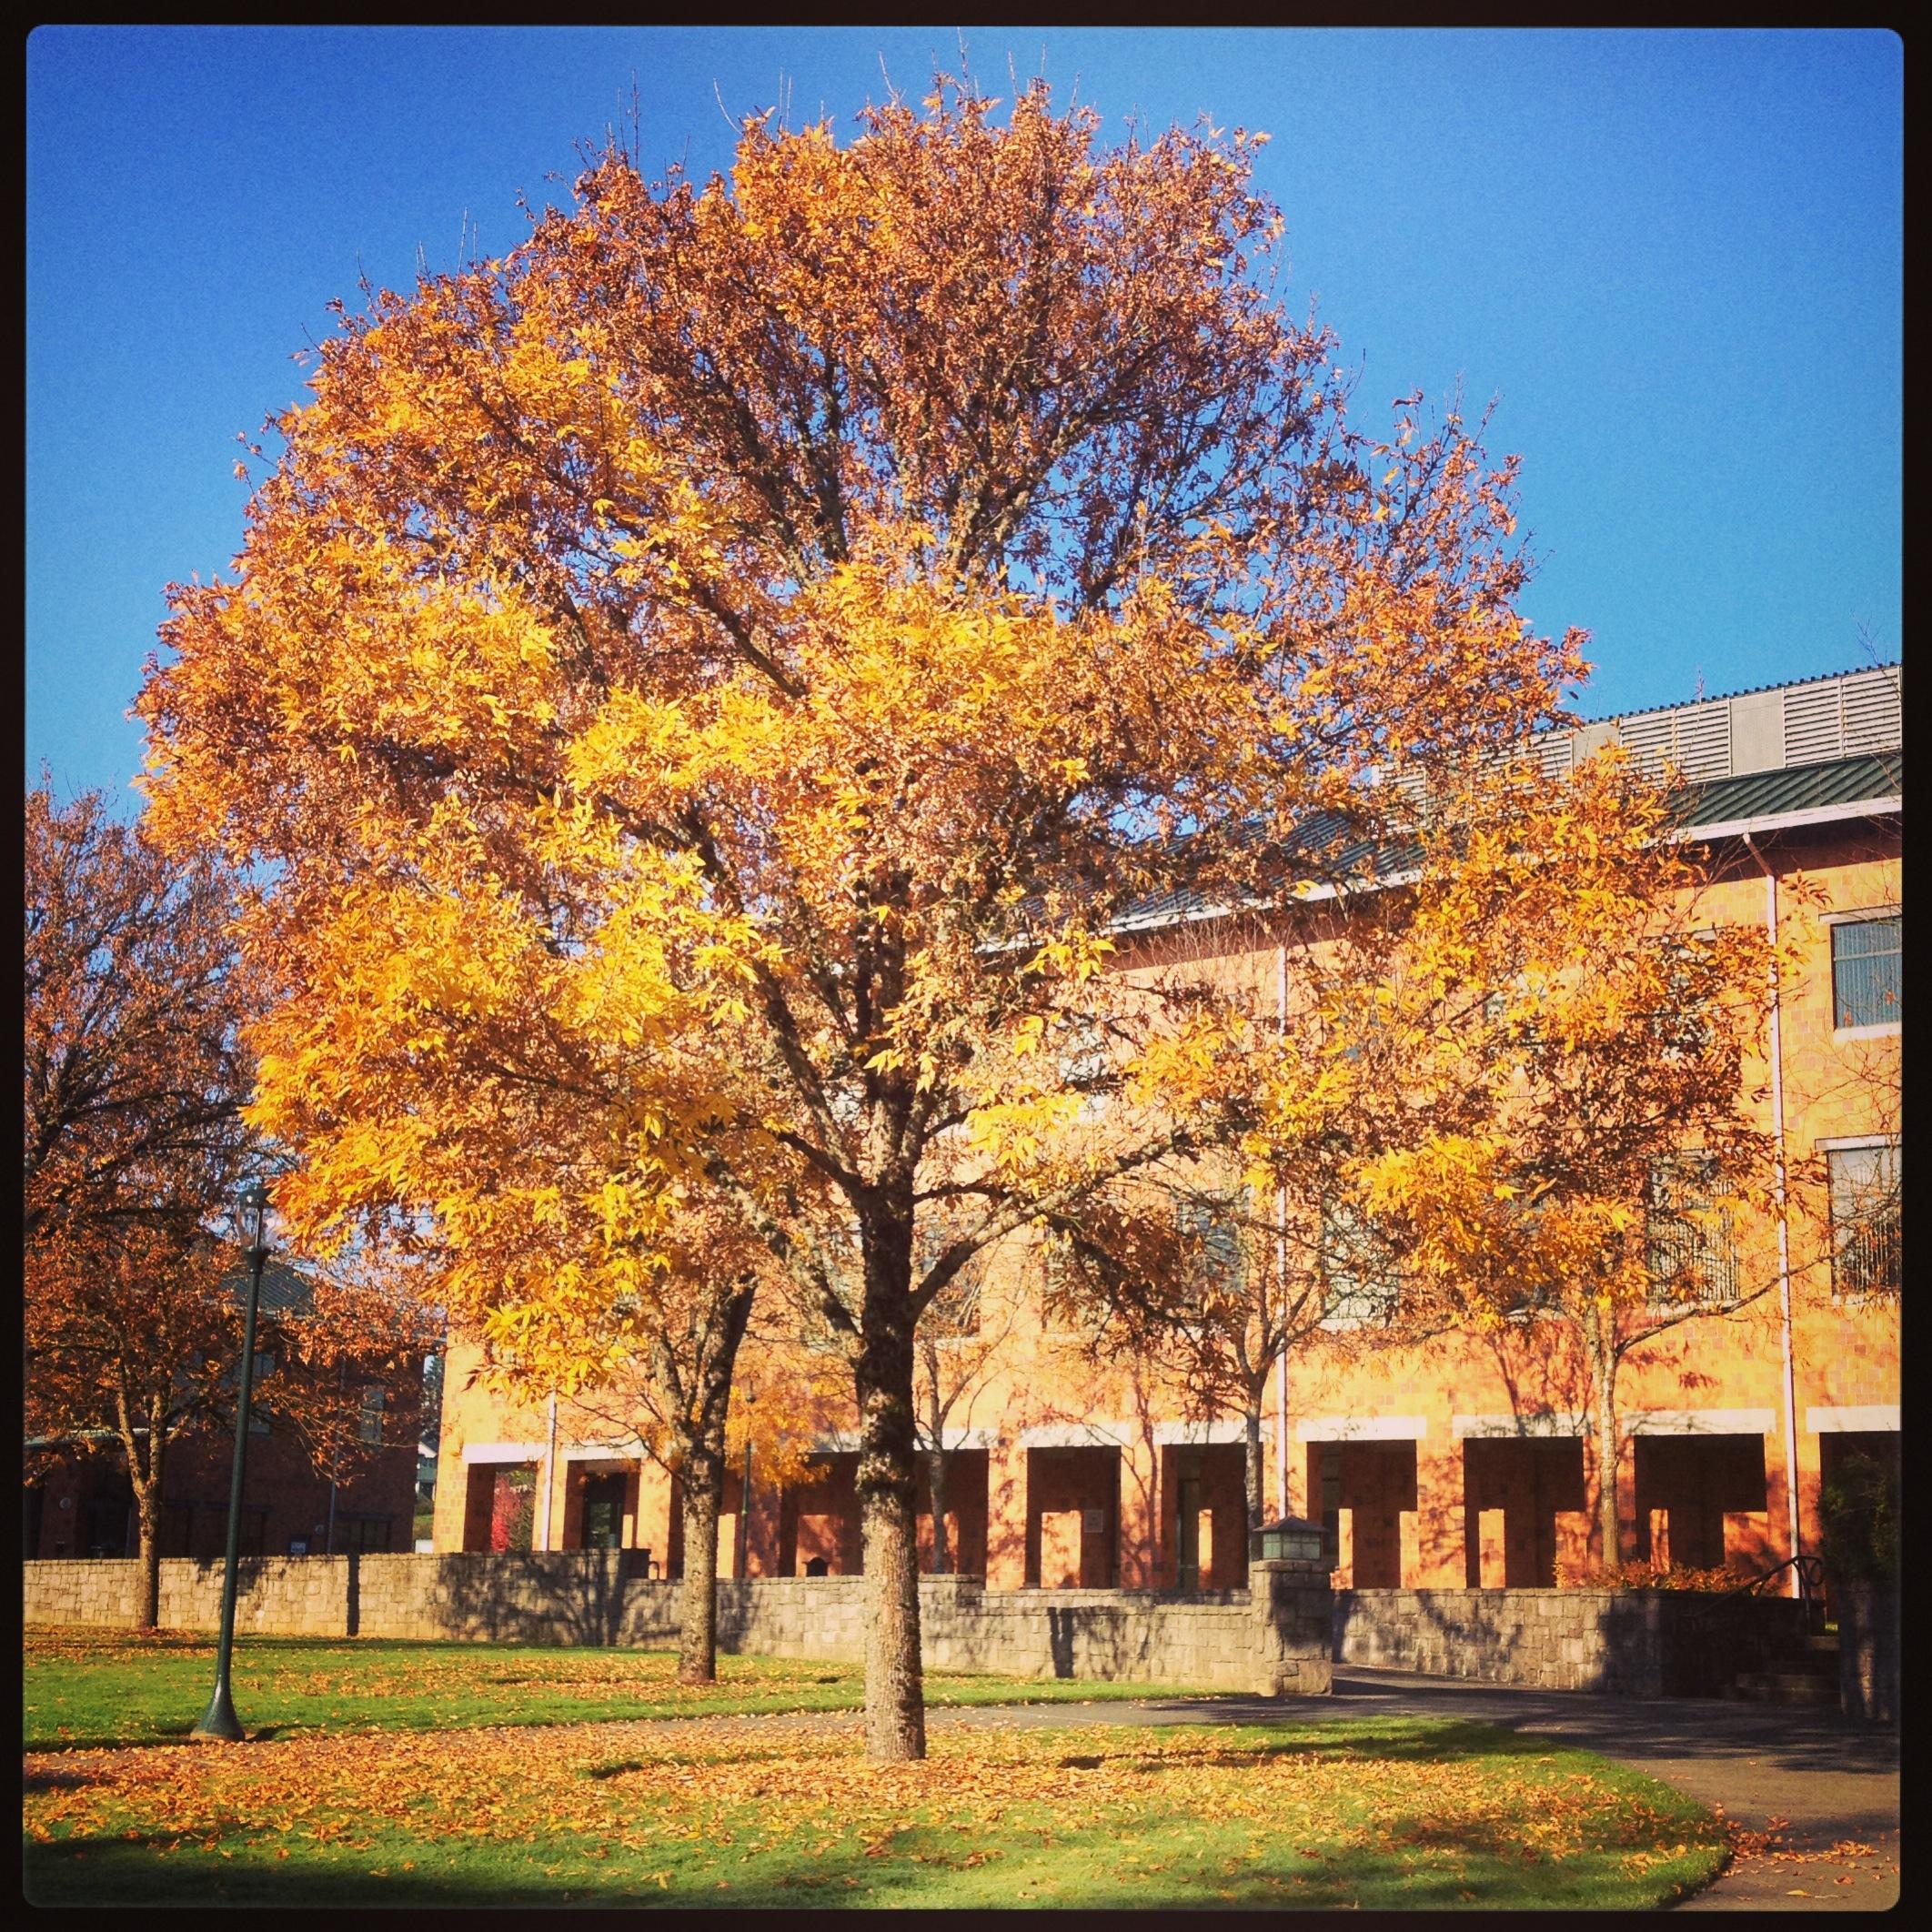 On campus.